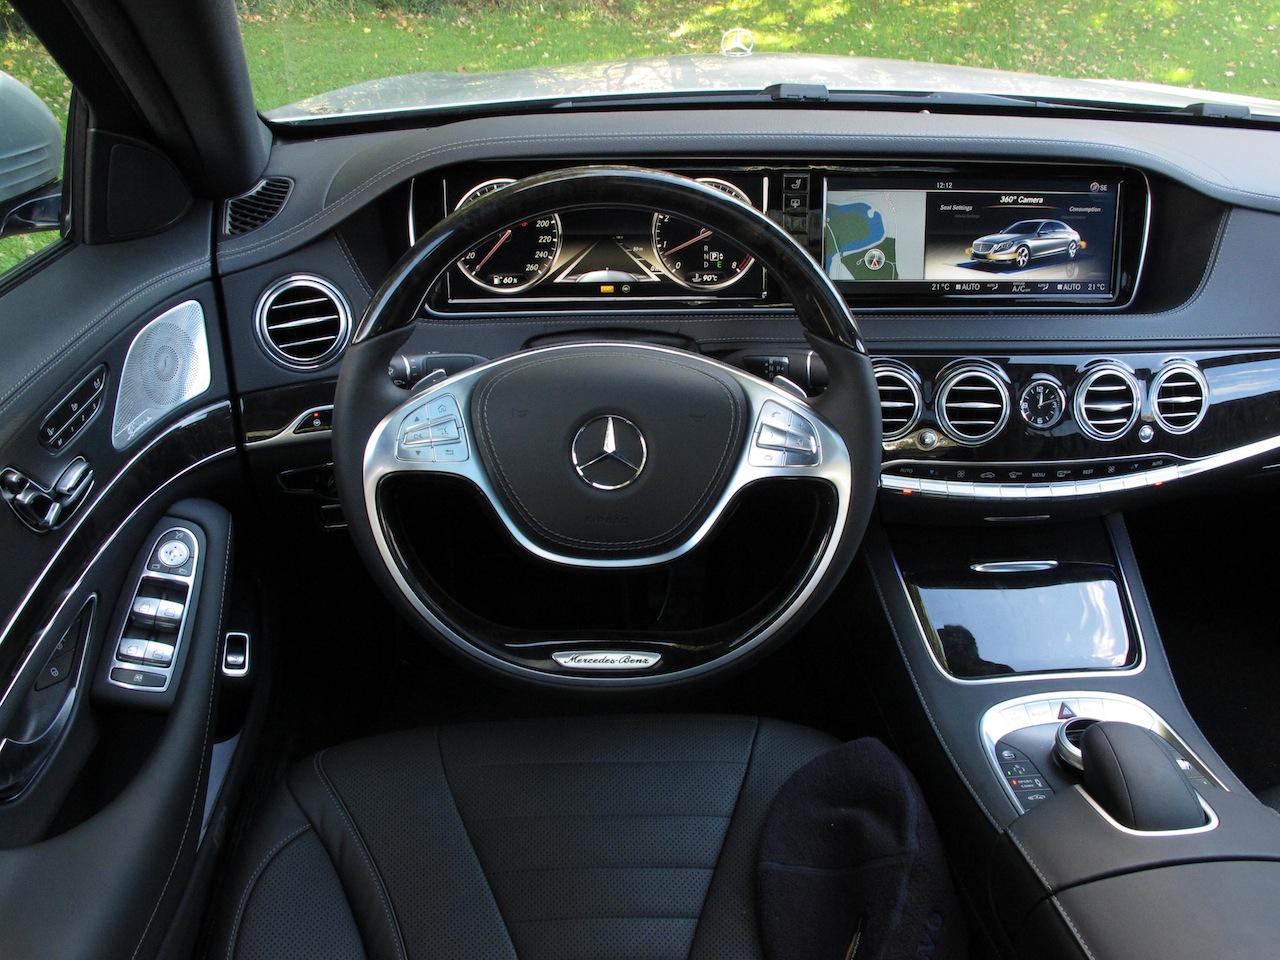 2014 mercedesbenz s550 photo gallery cars photos test